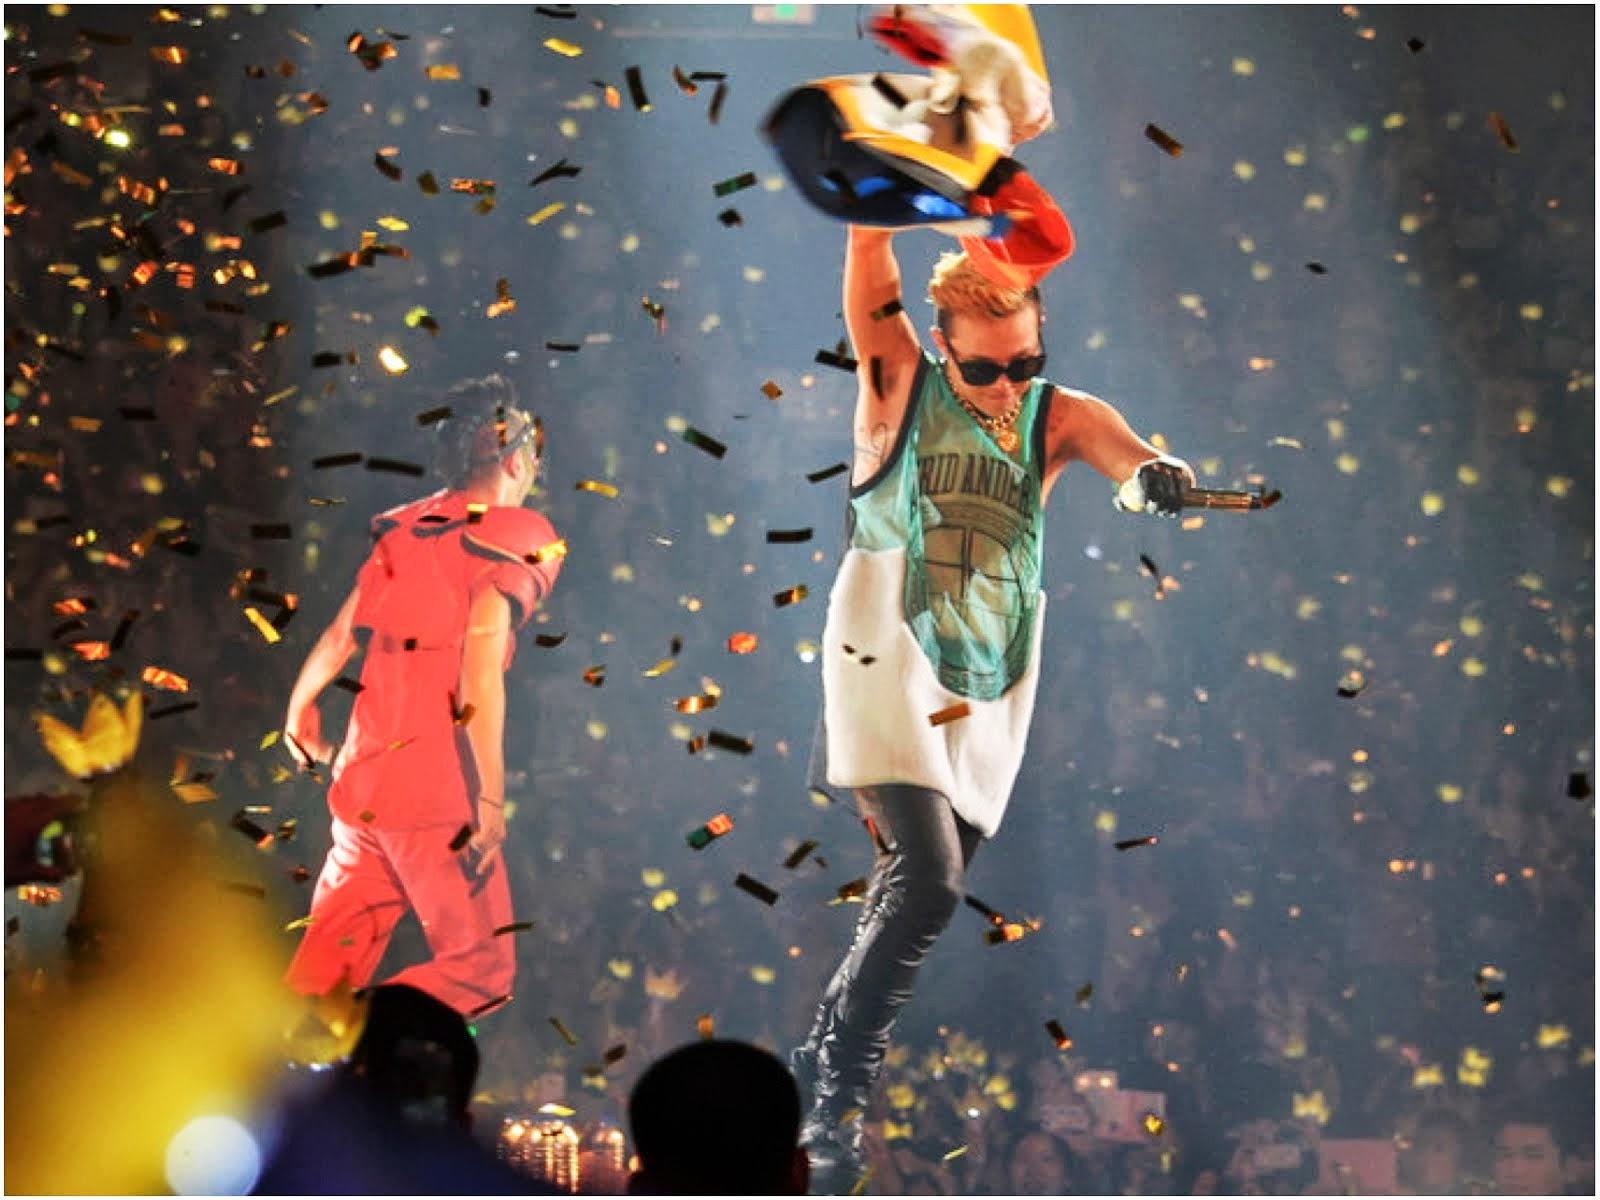 00O00 Menswear Blog: G-Dragon from Big Bang in Astrid Andersen - World Tour 2013 Shanghai Concert May 2013